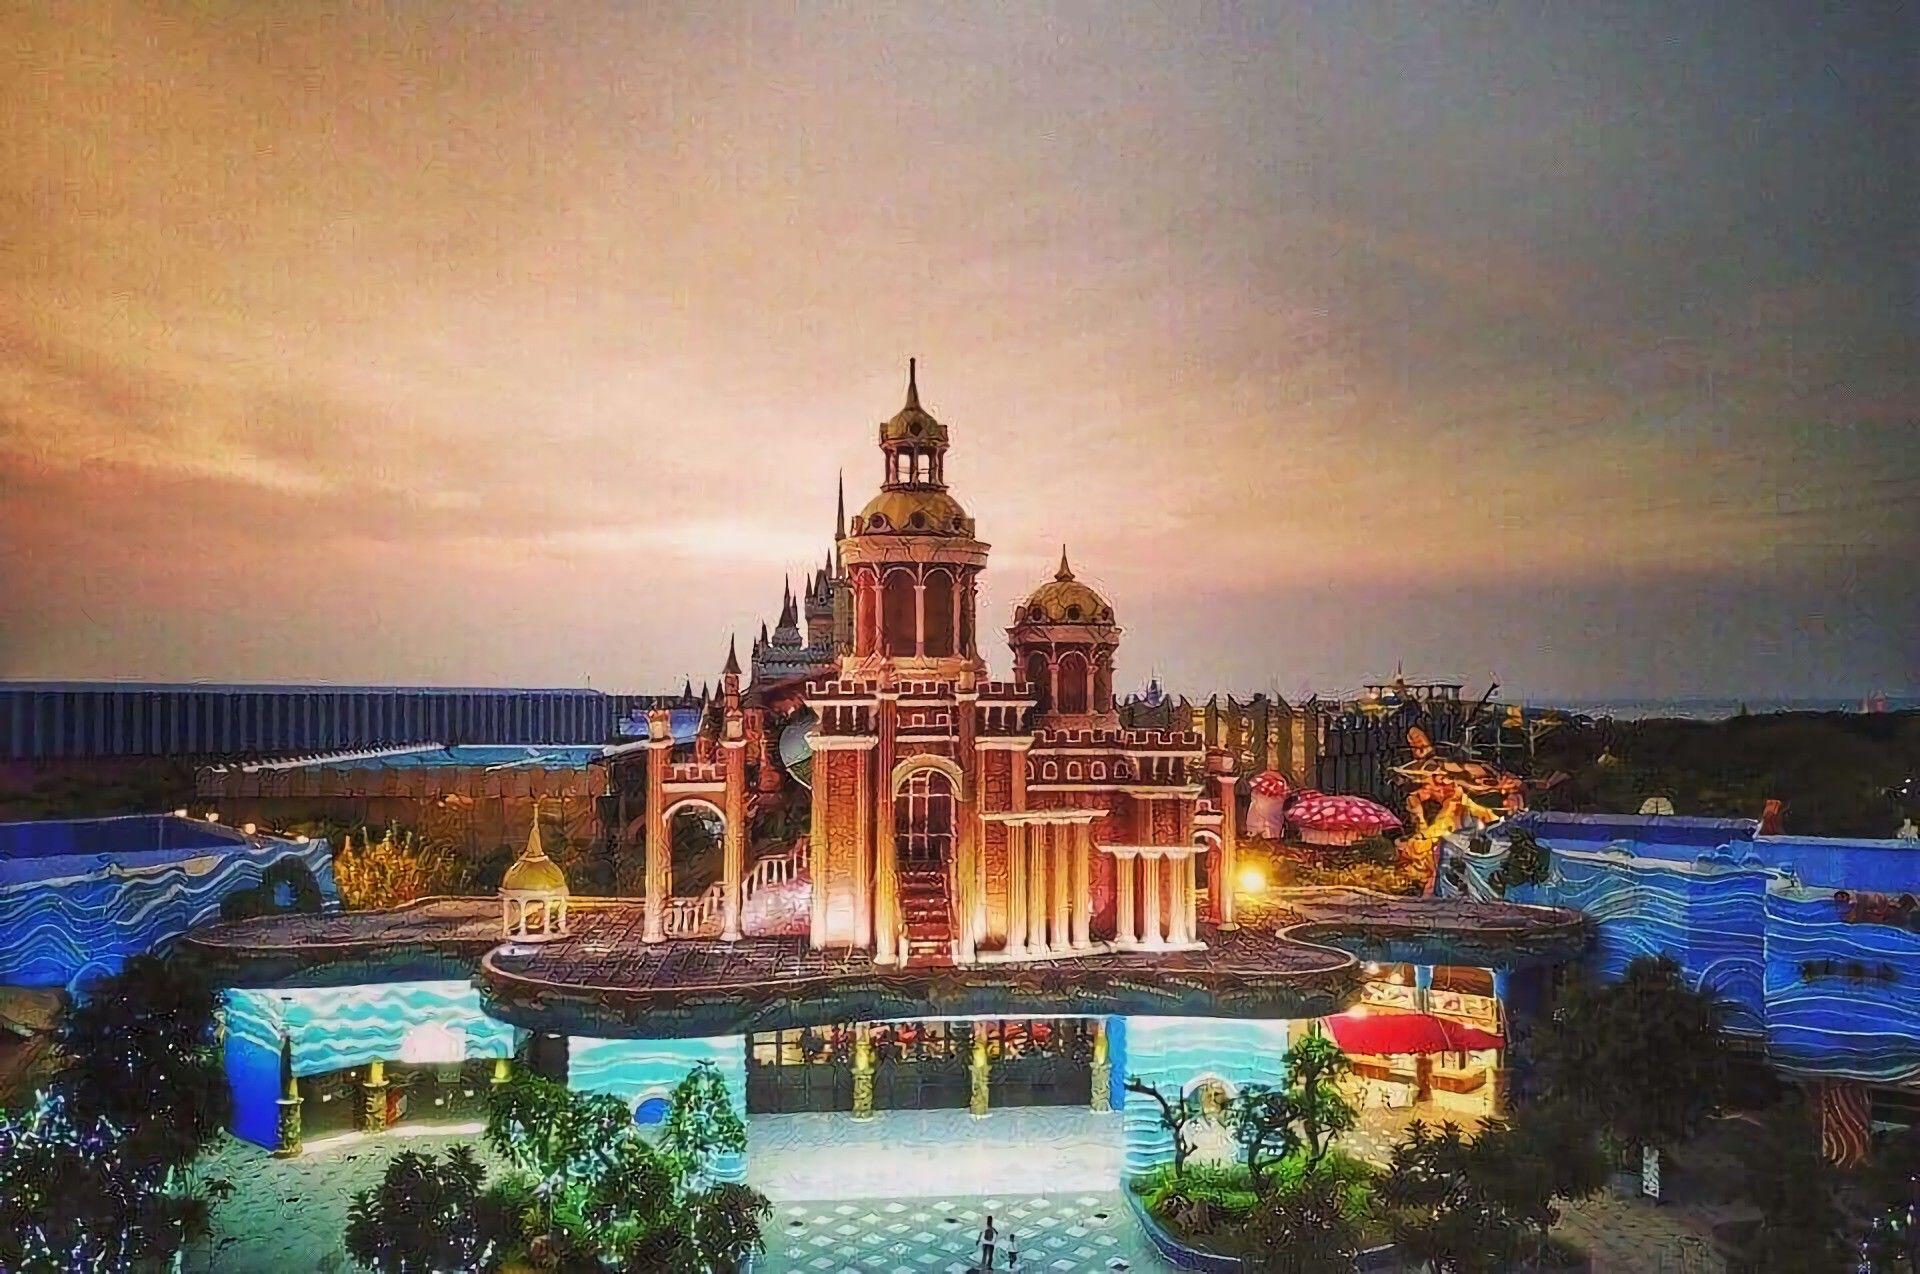 Tempat Wisata Surabaya Punya Spot Bak Luar Negeri Keren 10